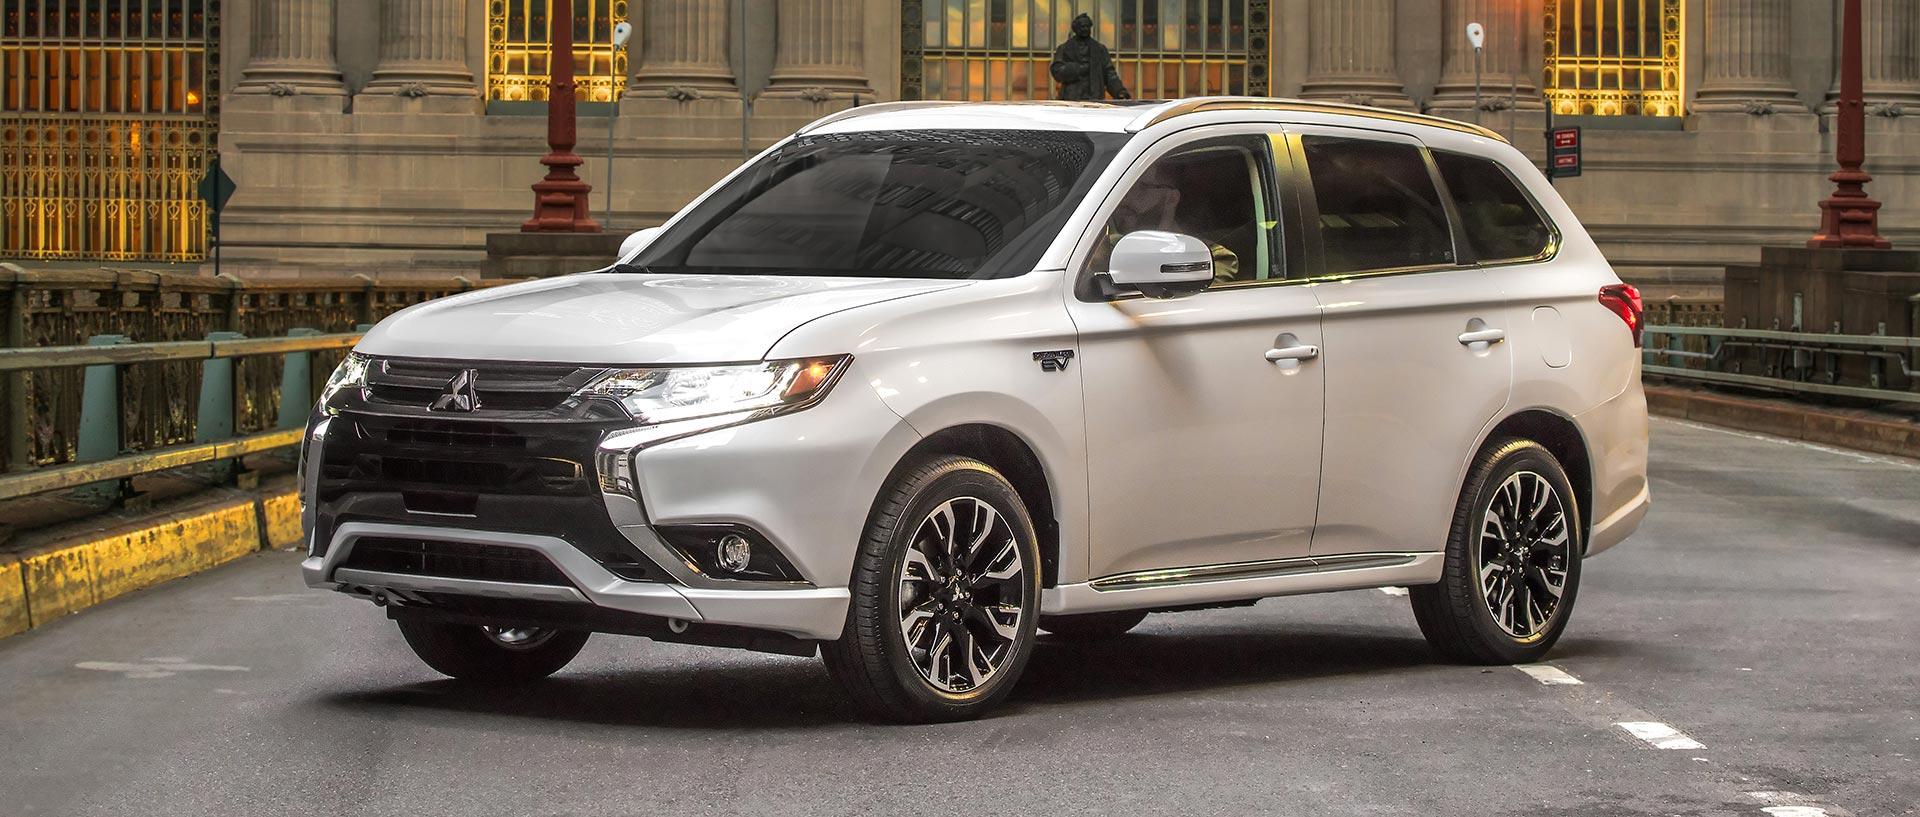 2017 Mitsubishi Outlander PHEV - Consumer Reports